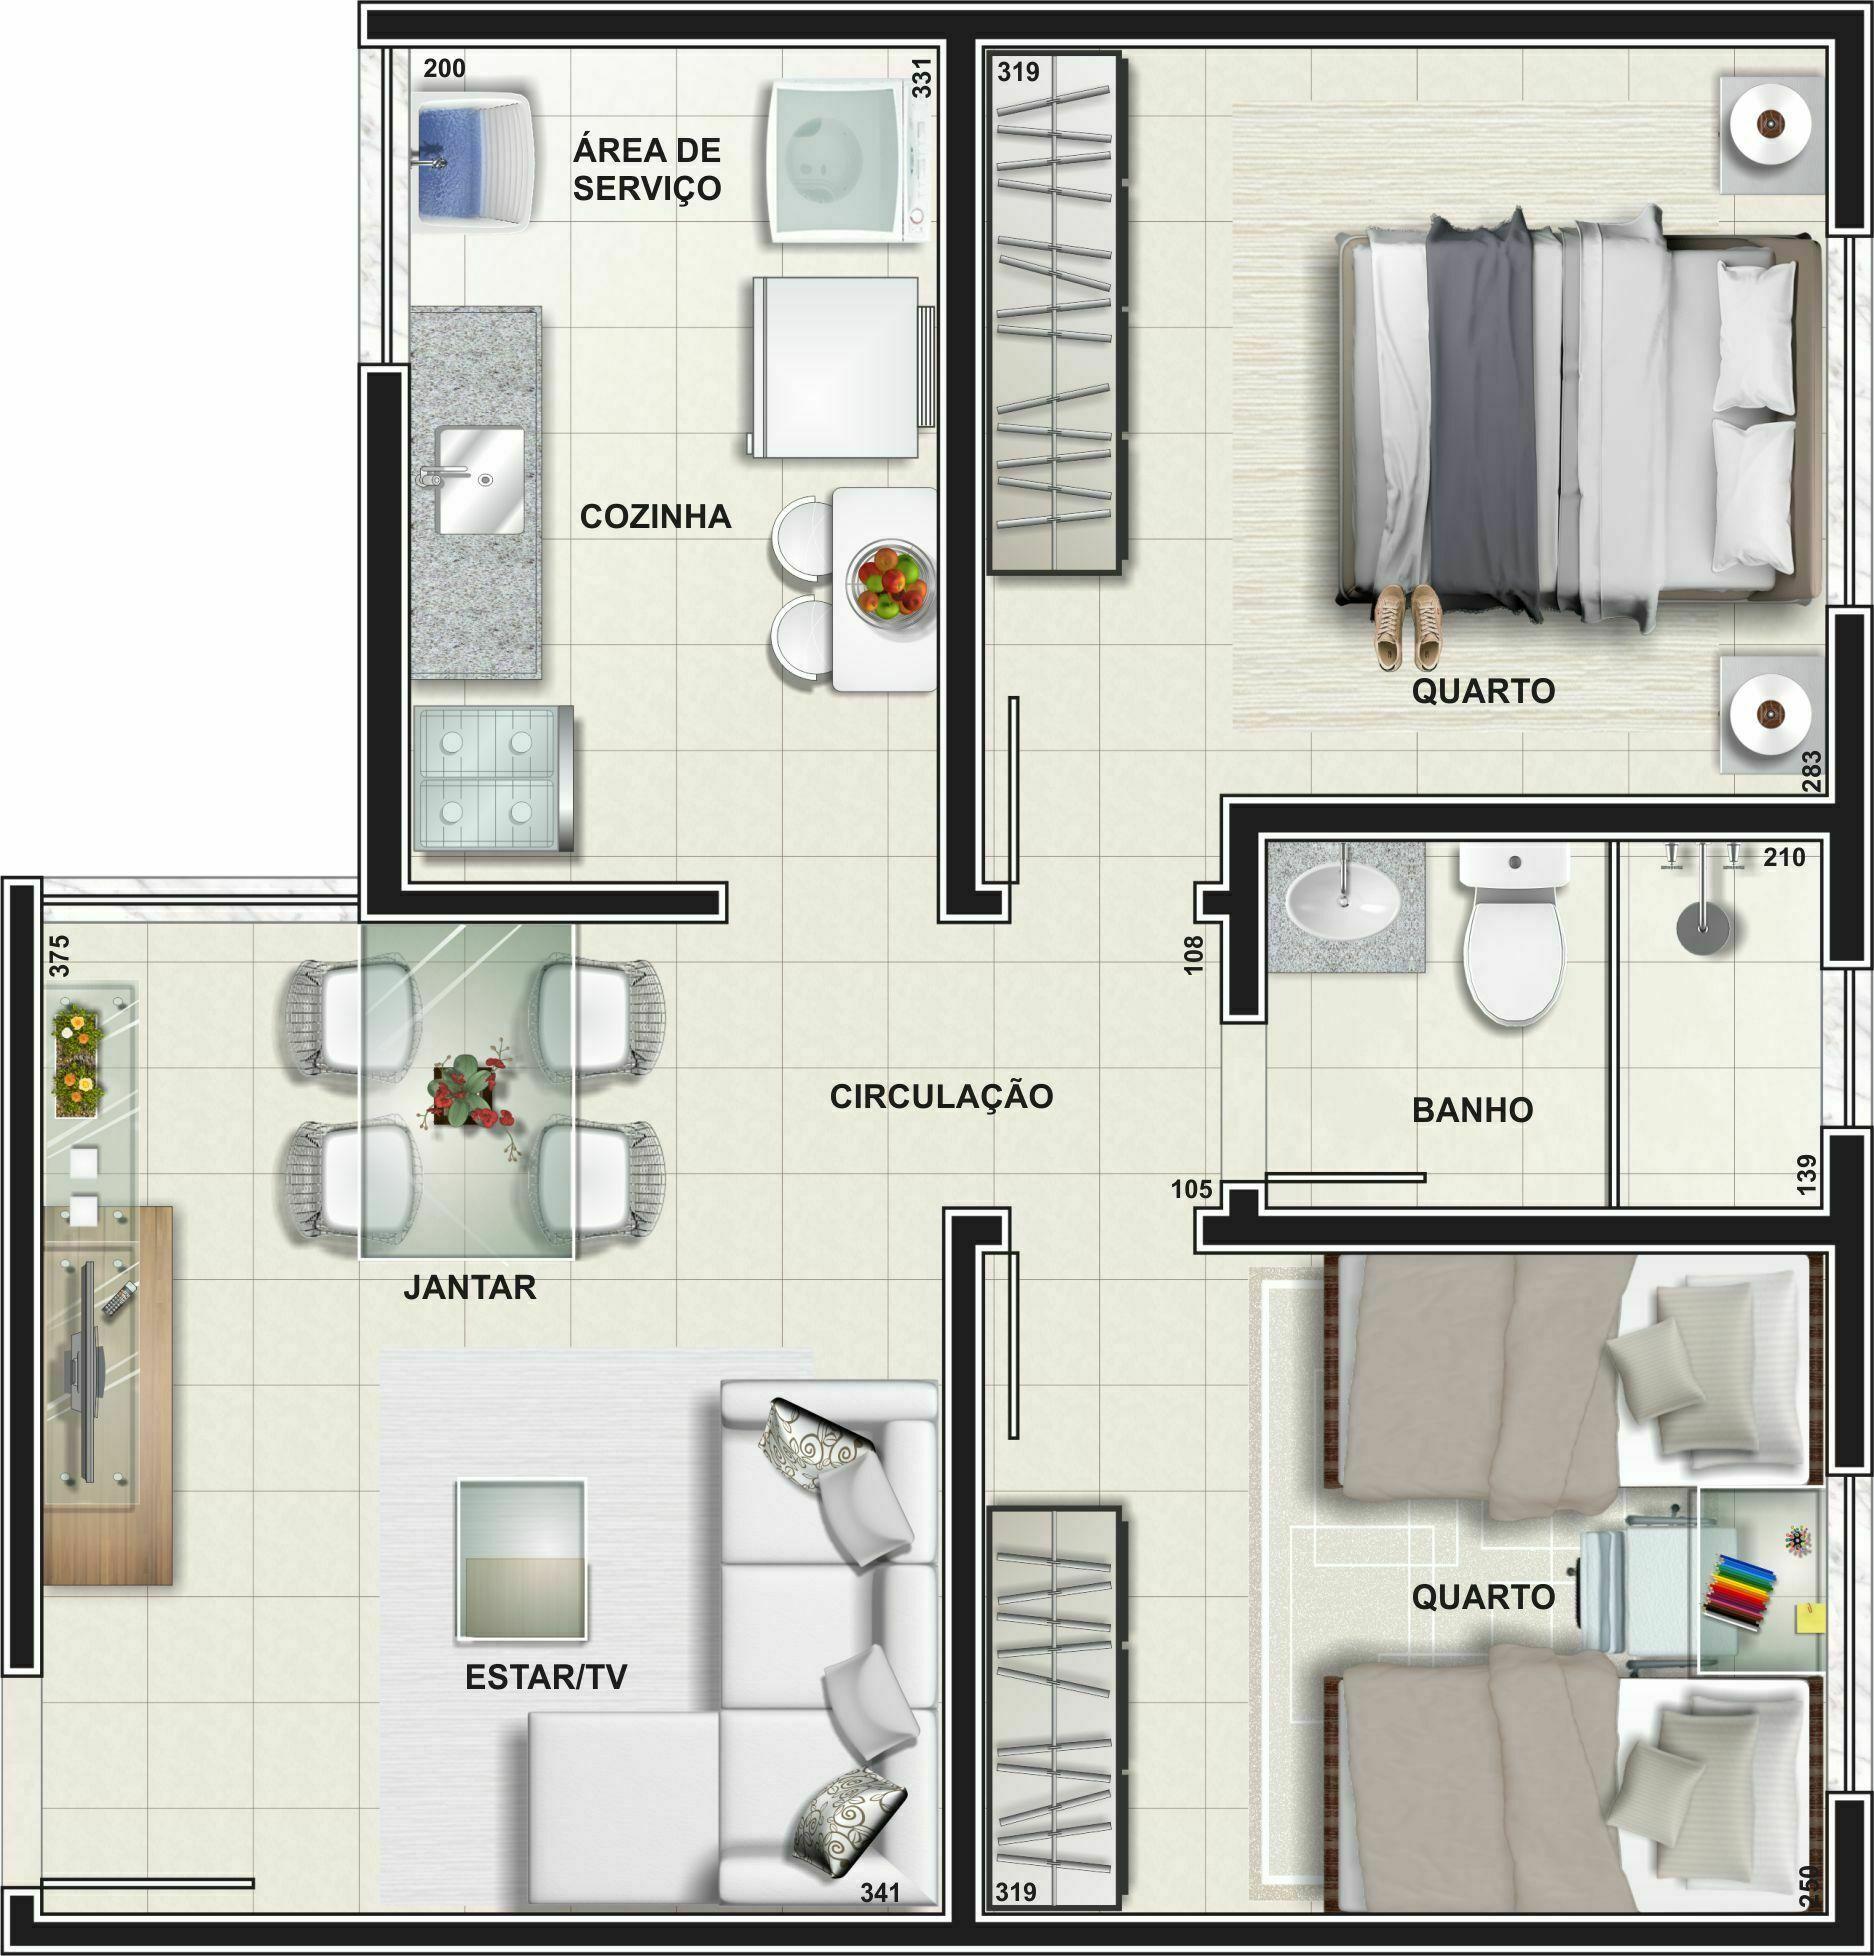 Planta Apartamento - Tipo 02 - 46,88 m²